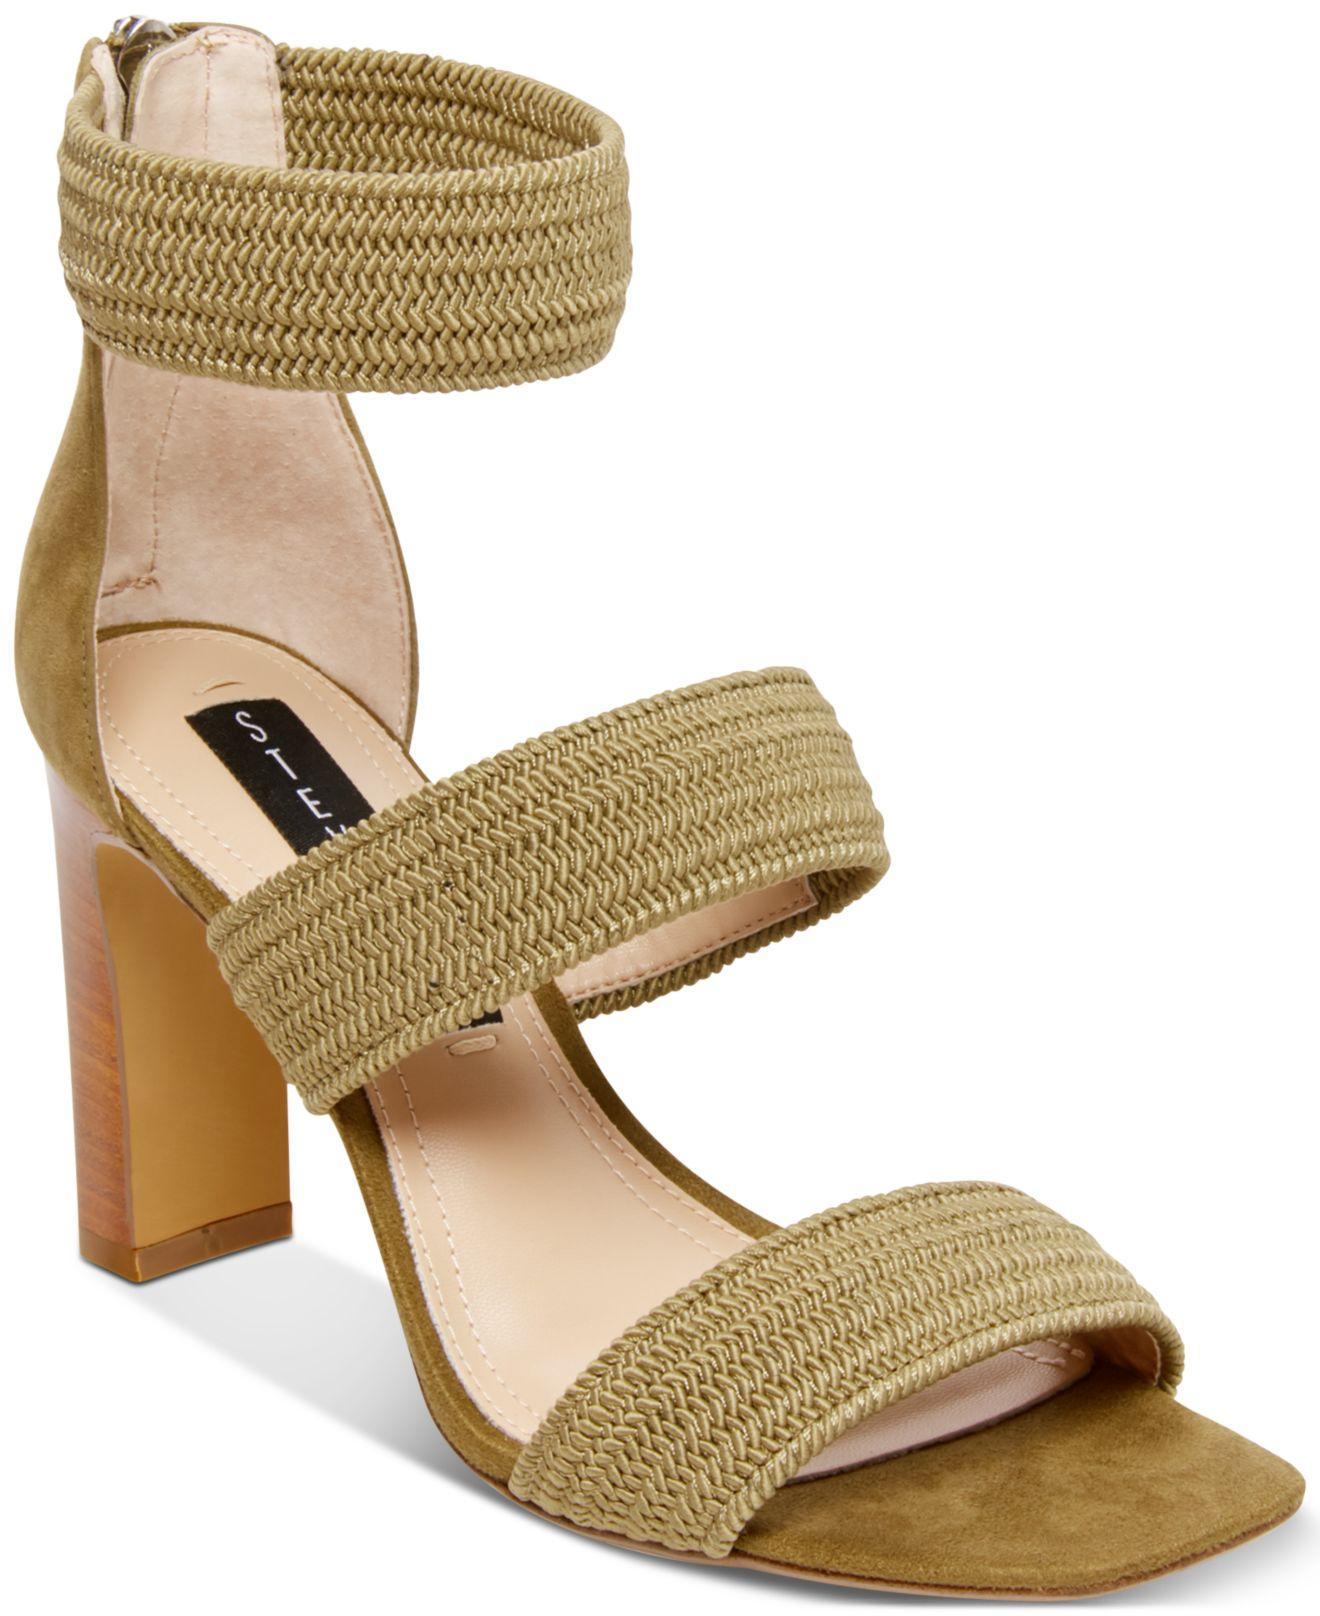 f0b3357c6fbf Lyst - Steven by Steve Madden Jelly Stretch Dress Sandals in Green